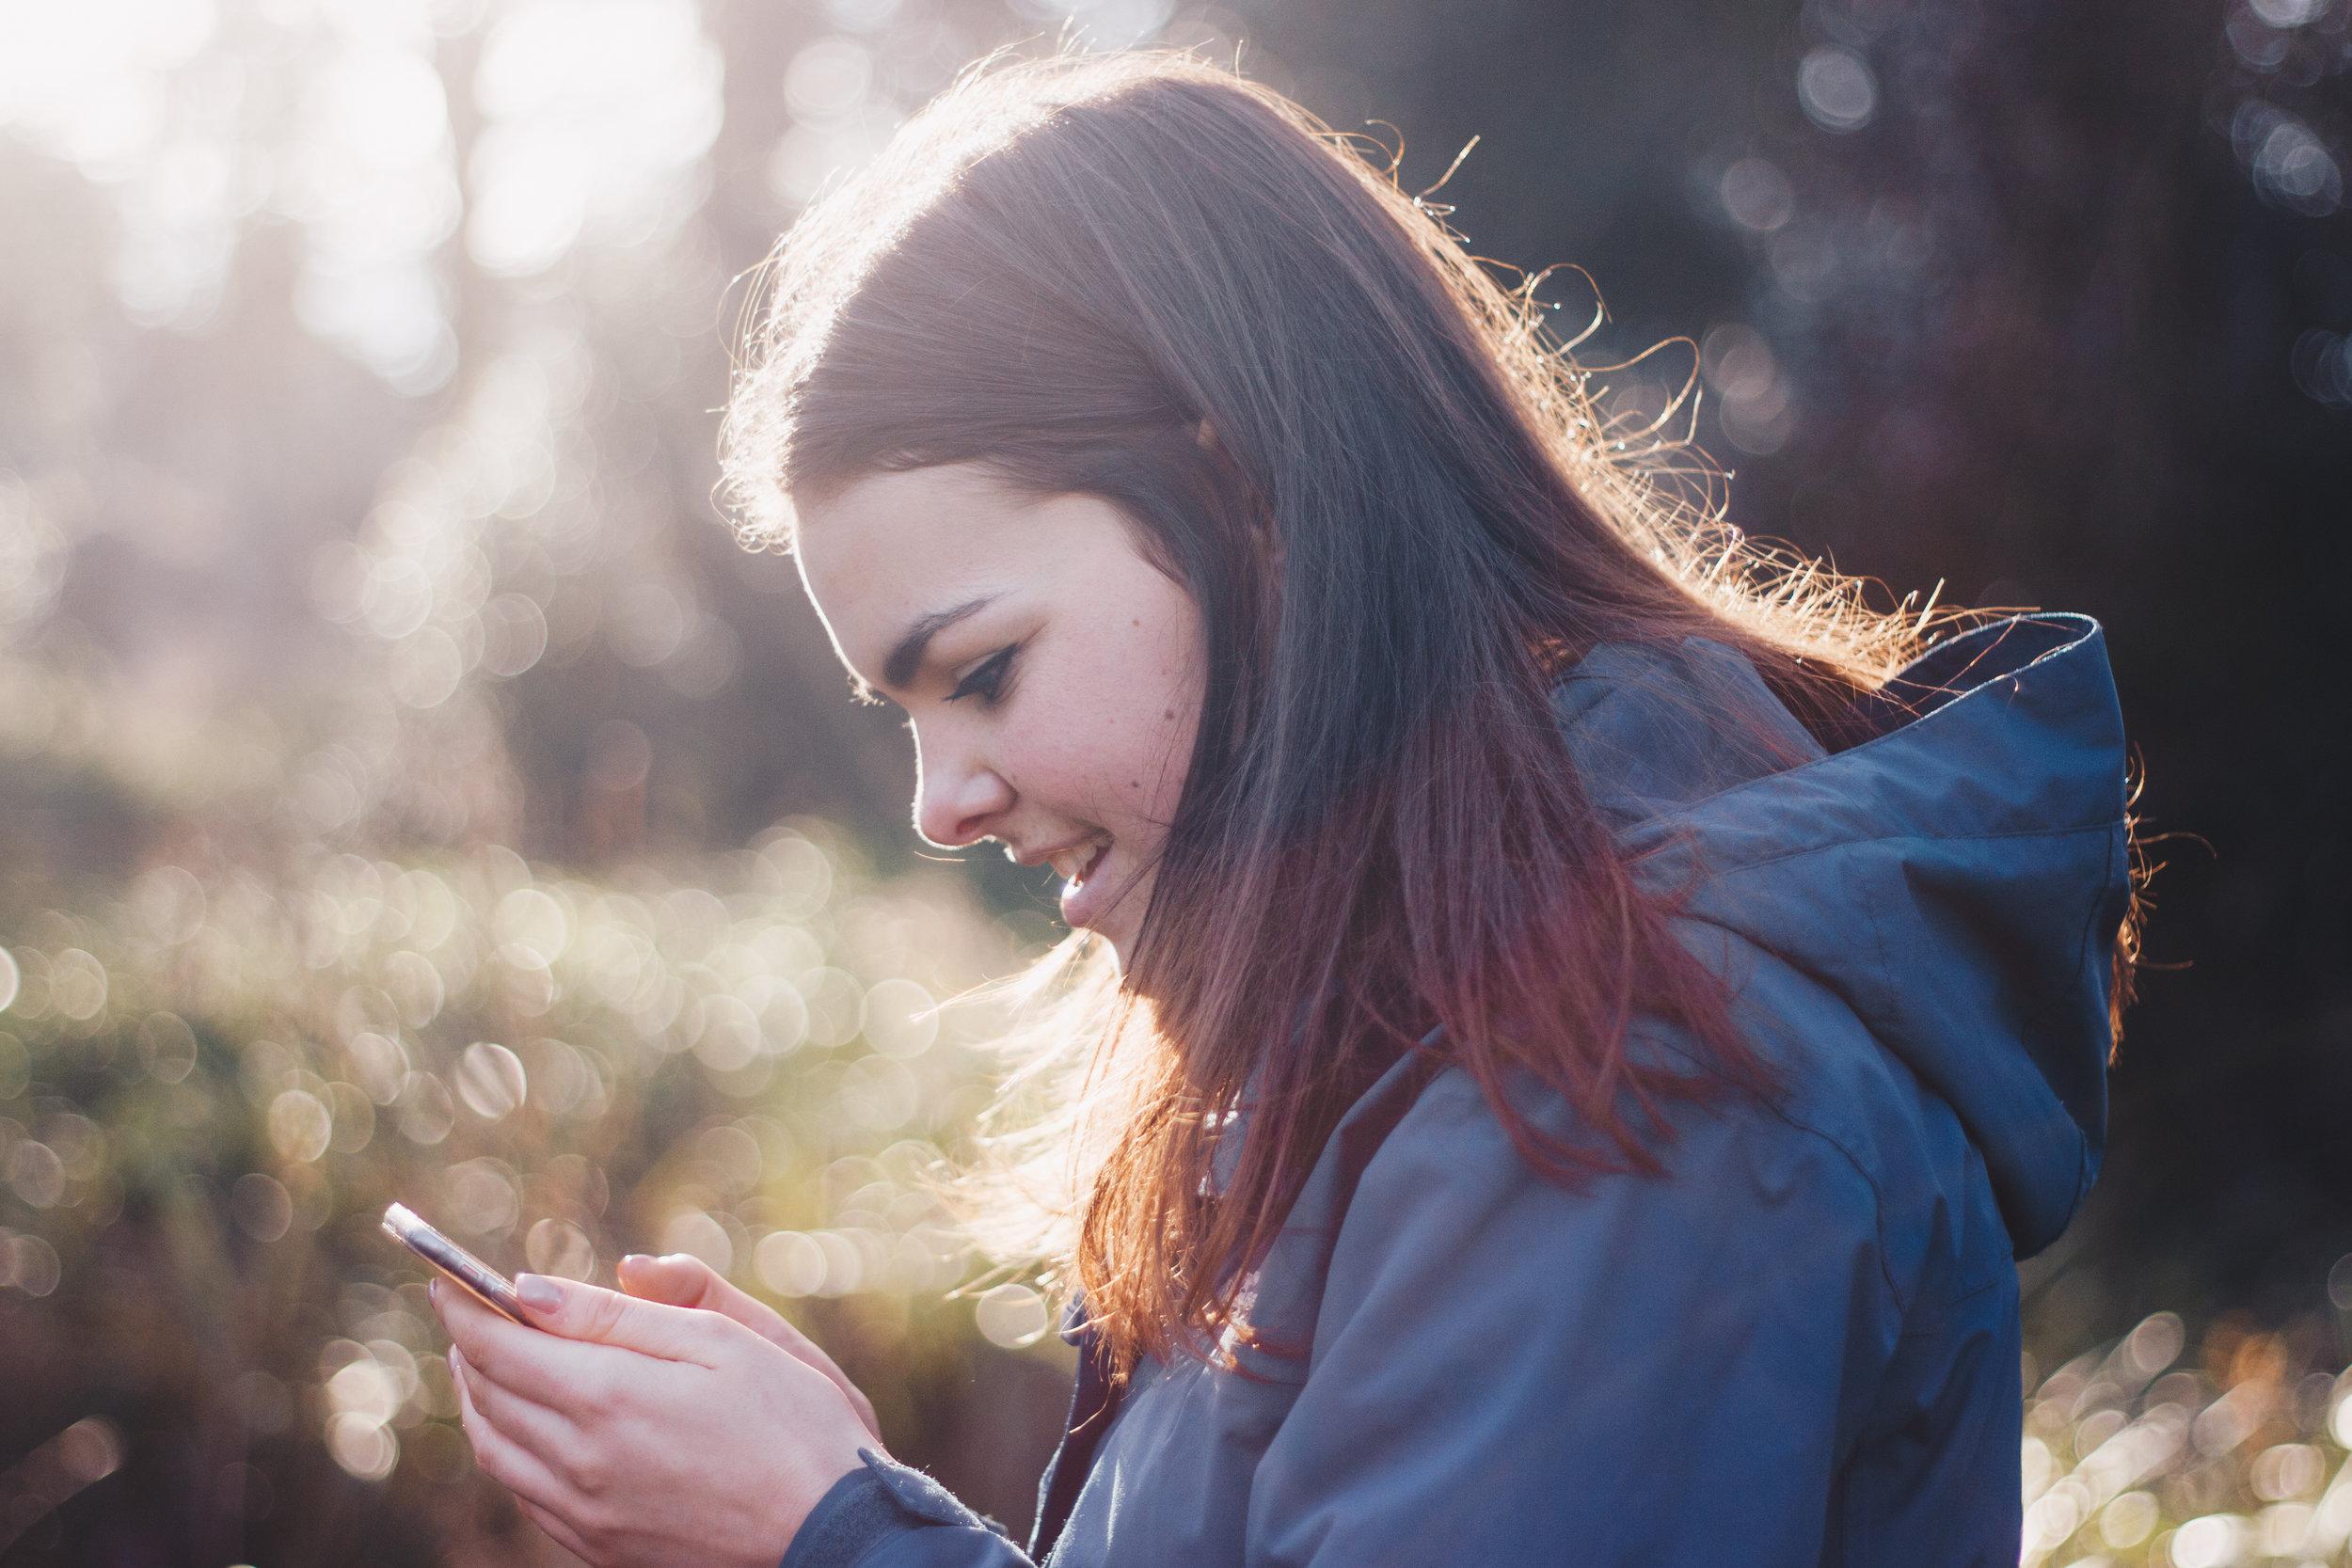 Woman looking down at smartphone,  Luke Porter  (CC0)